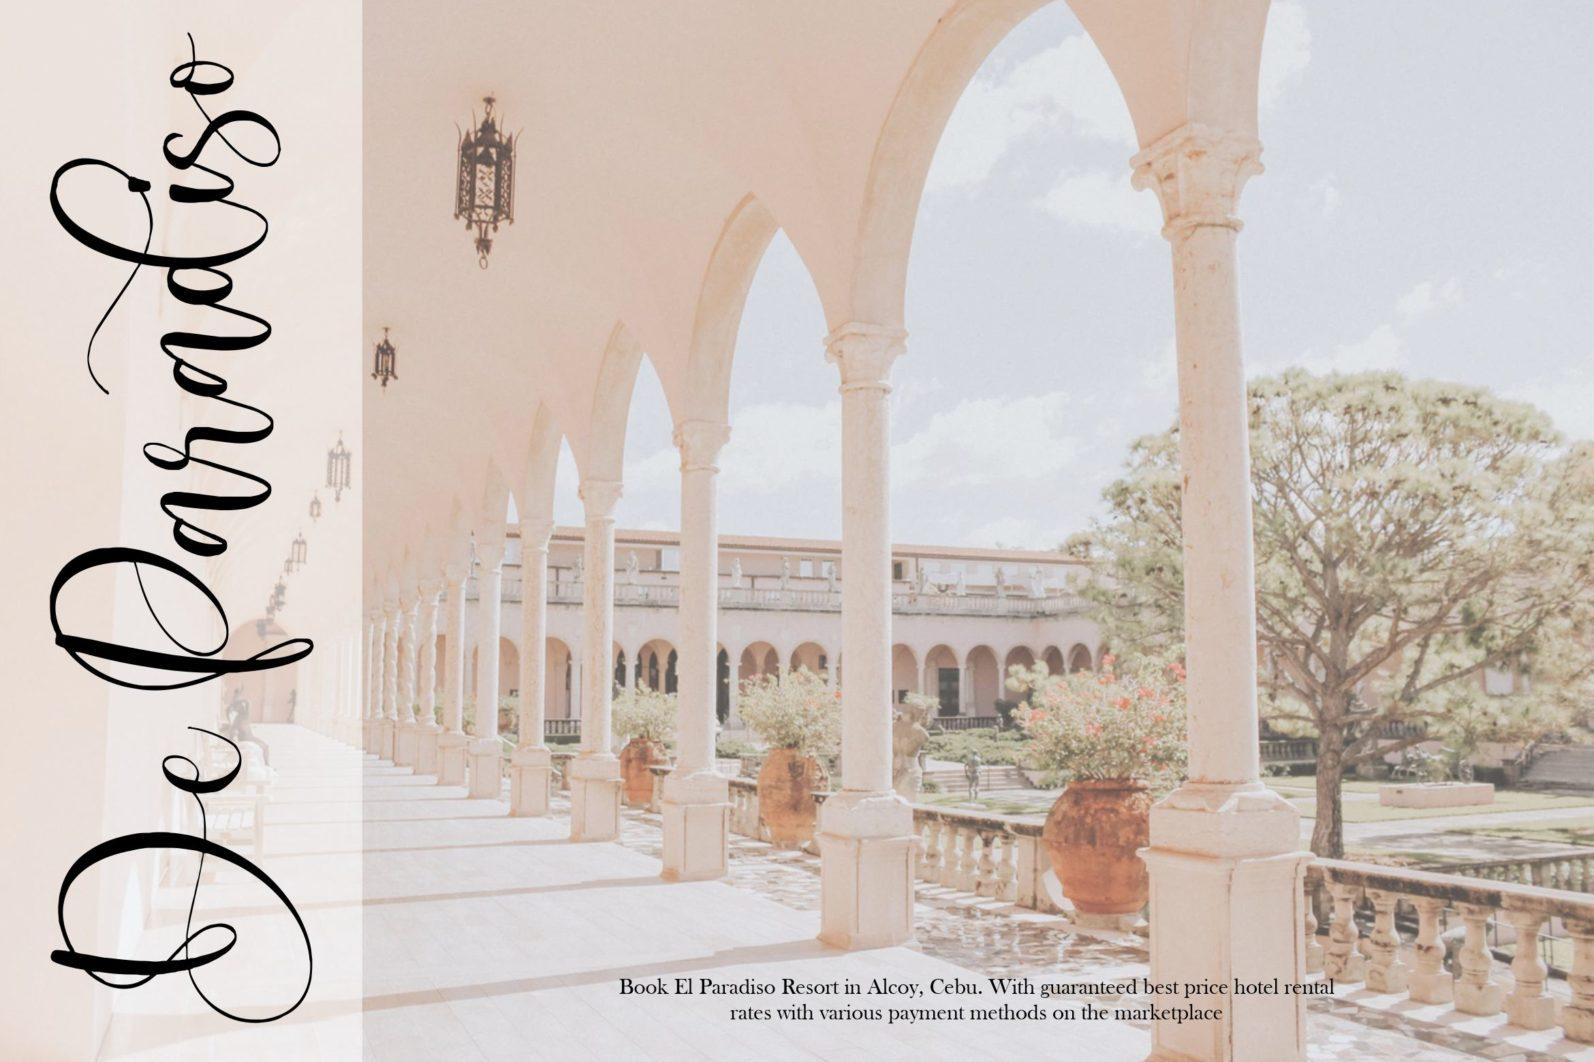 Magnolin Beautiful Calligraphy Font - 3 99 -